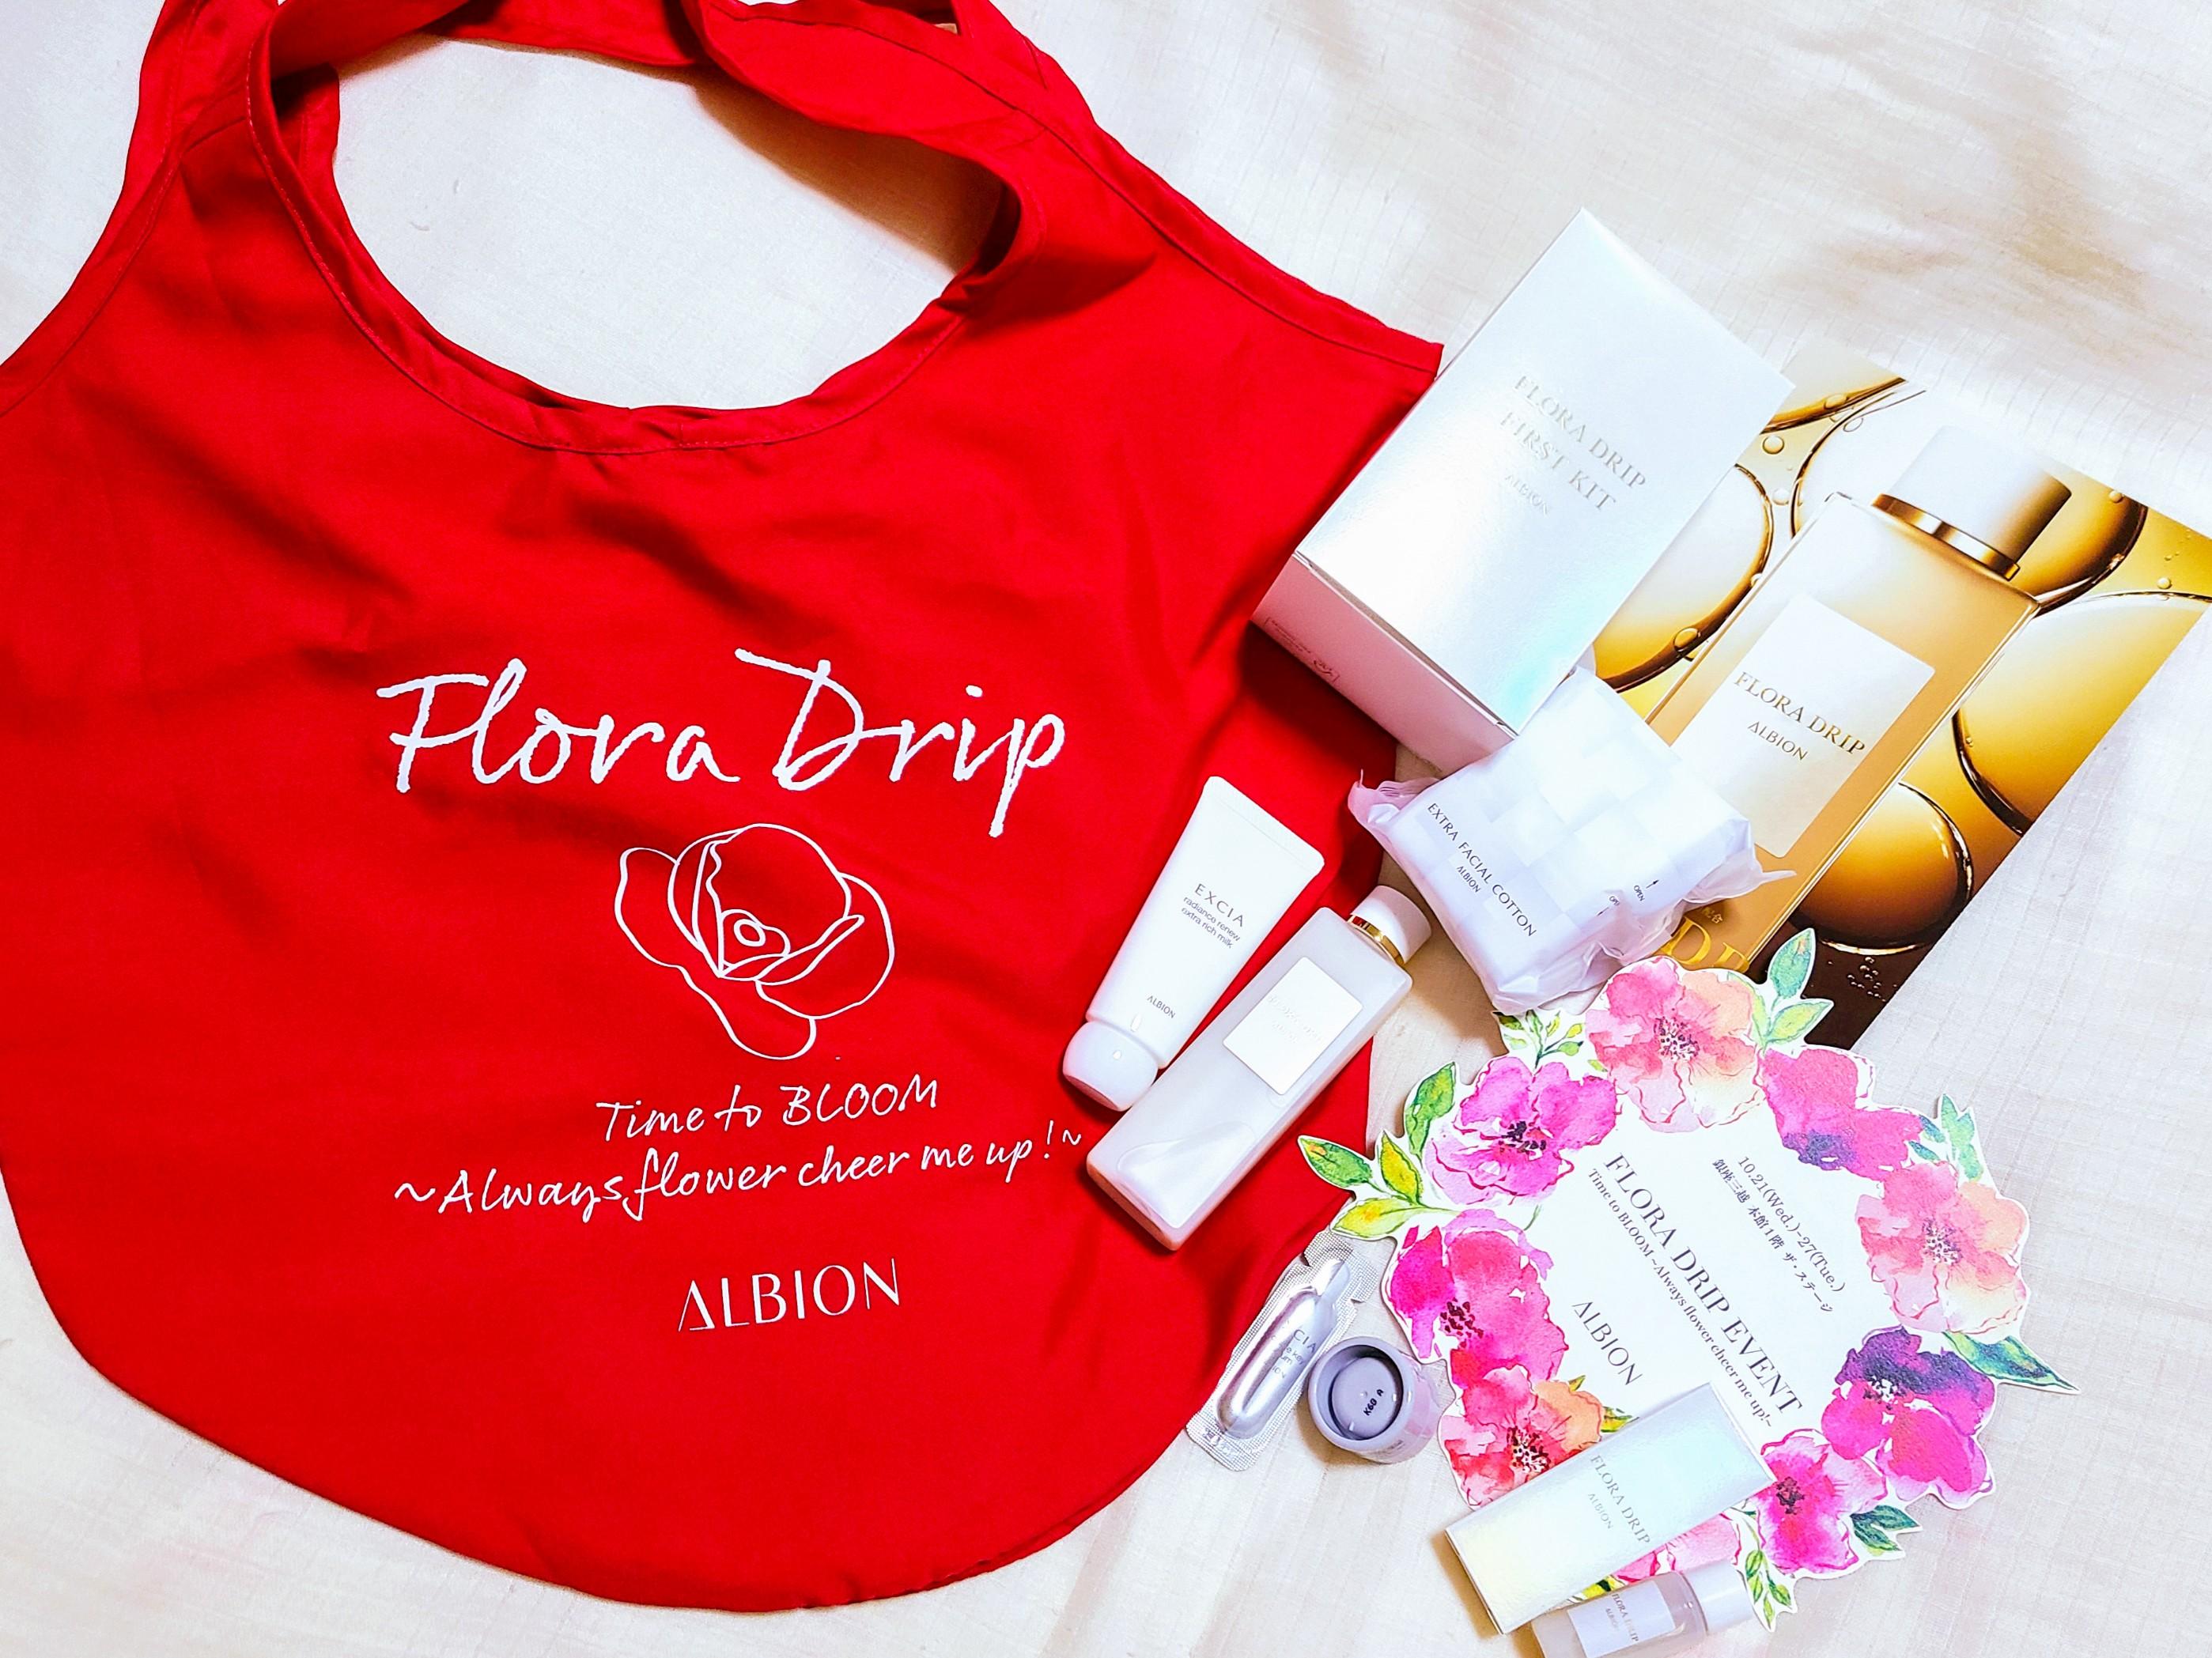 【ALBION】化粧液『FLORA DRIP』が万能過ぎる!!_3